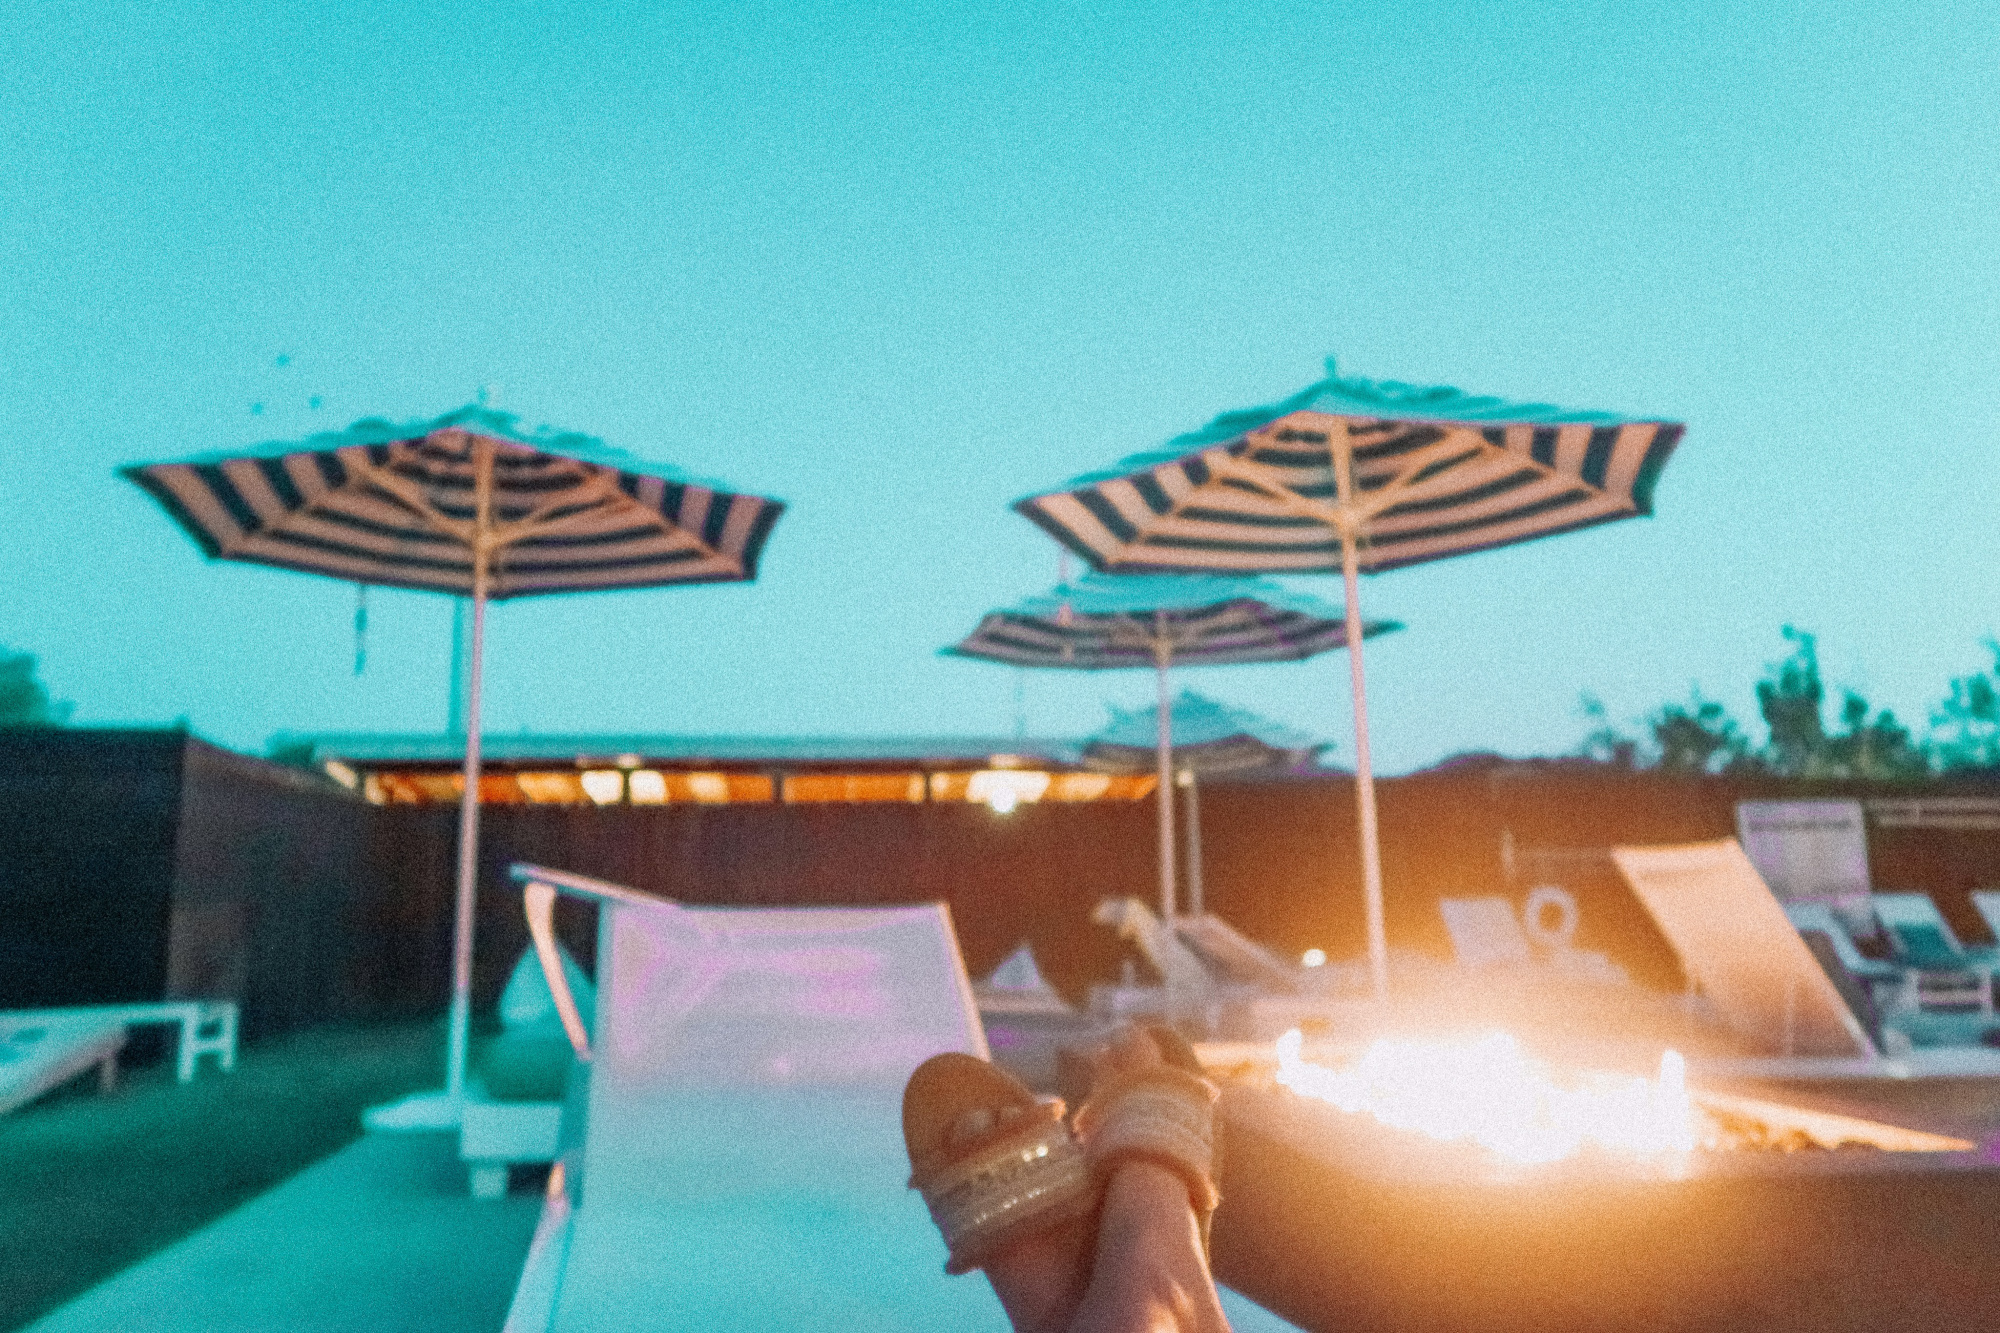 Calistoga california, calistoga, winery, Chateau Montelena Winery, Castello di Amorosa, coast of California, pacific highway, highway one, Napa valley, Napa, California hotels, tour guide, vacation guide, road trip, Calistoga motor lodge, Sams social club, California travel